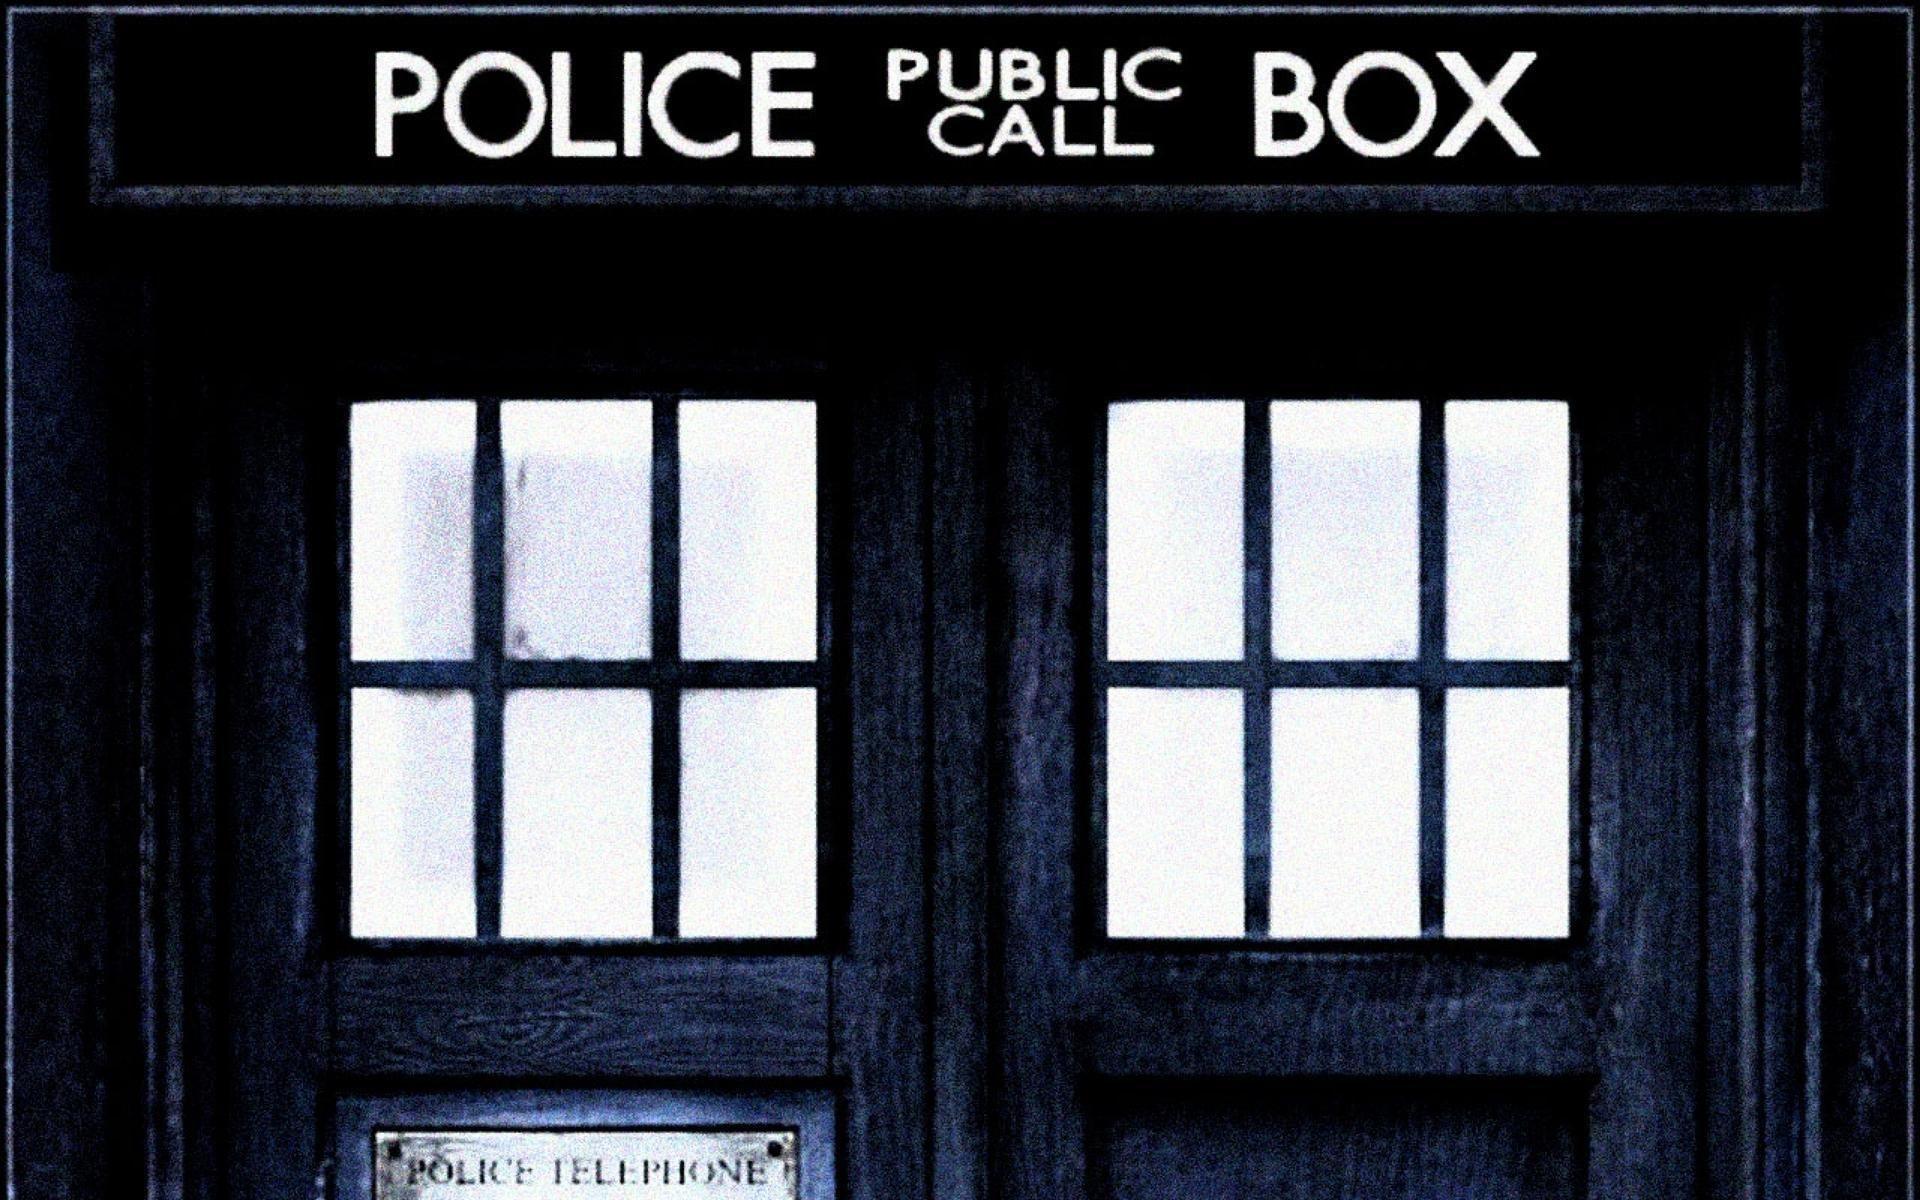 Doctor Who Tardis Wallpaper Hd Tardis Wallpaper Doctor Who Tardis